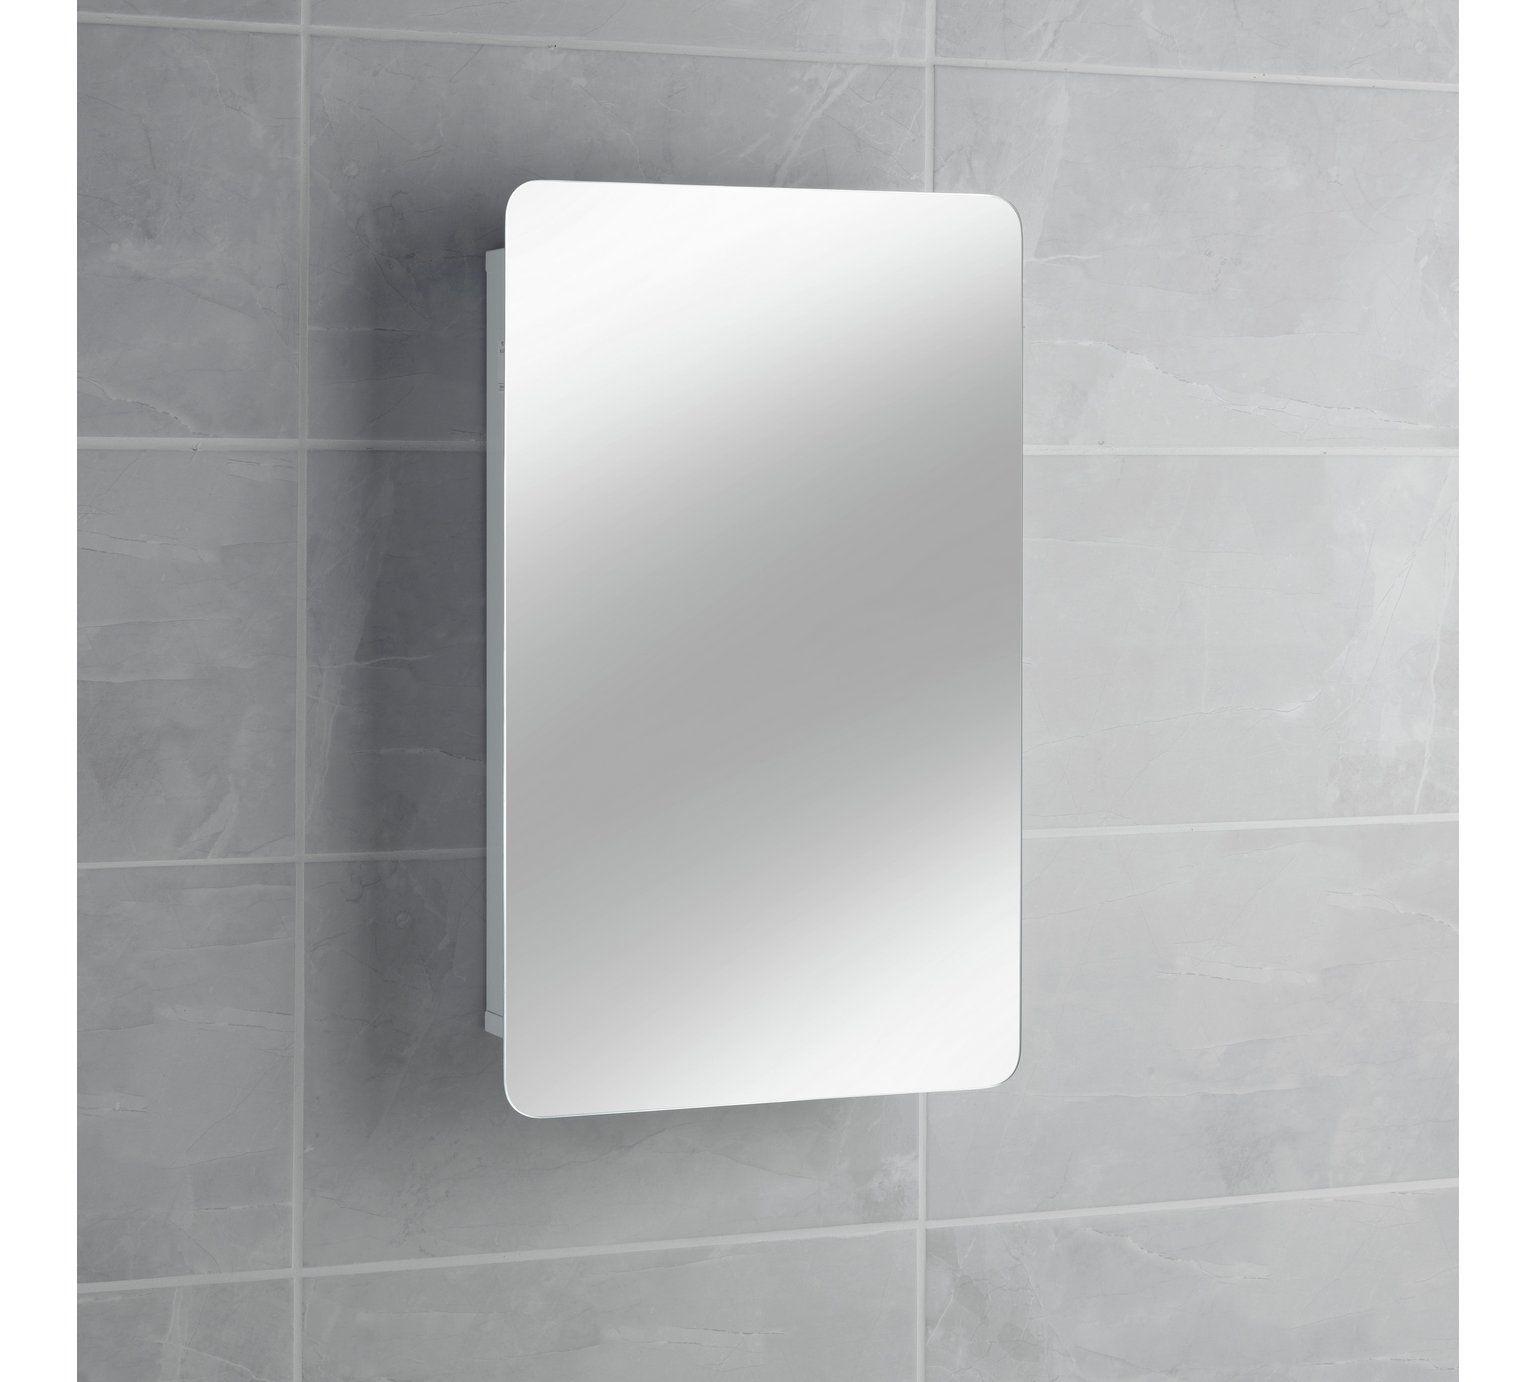 Buy Hygena Sliding Door Mirrored Bathroom Cabinet - White at Argos ...